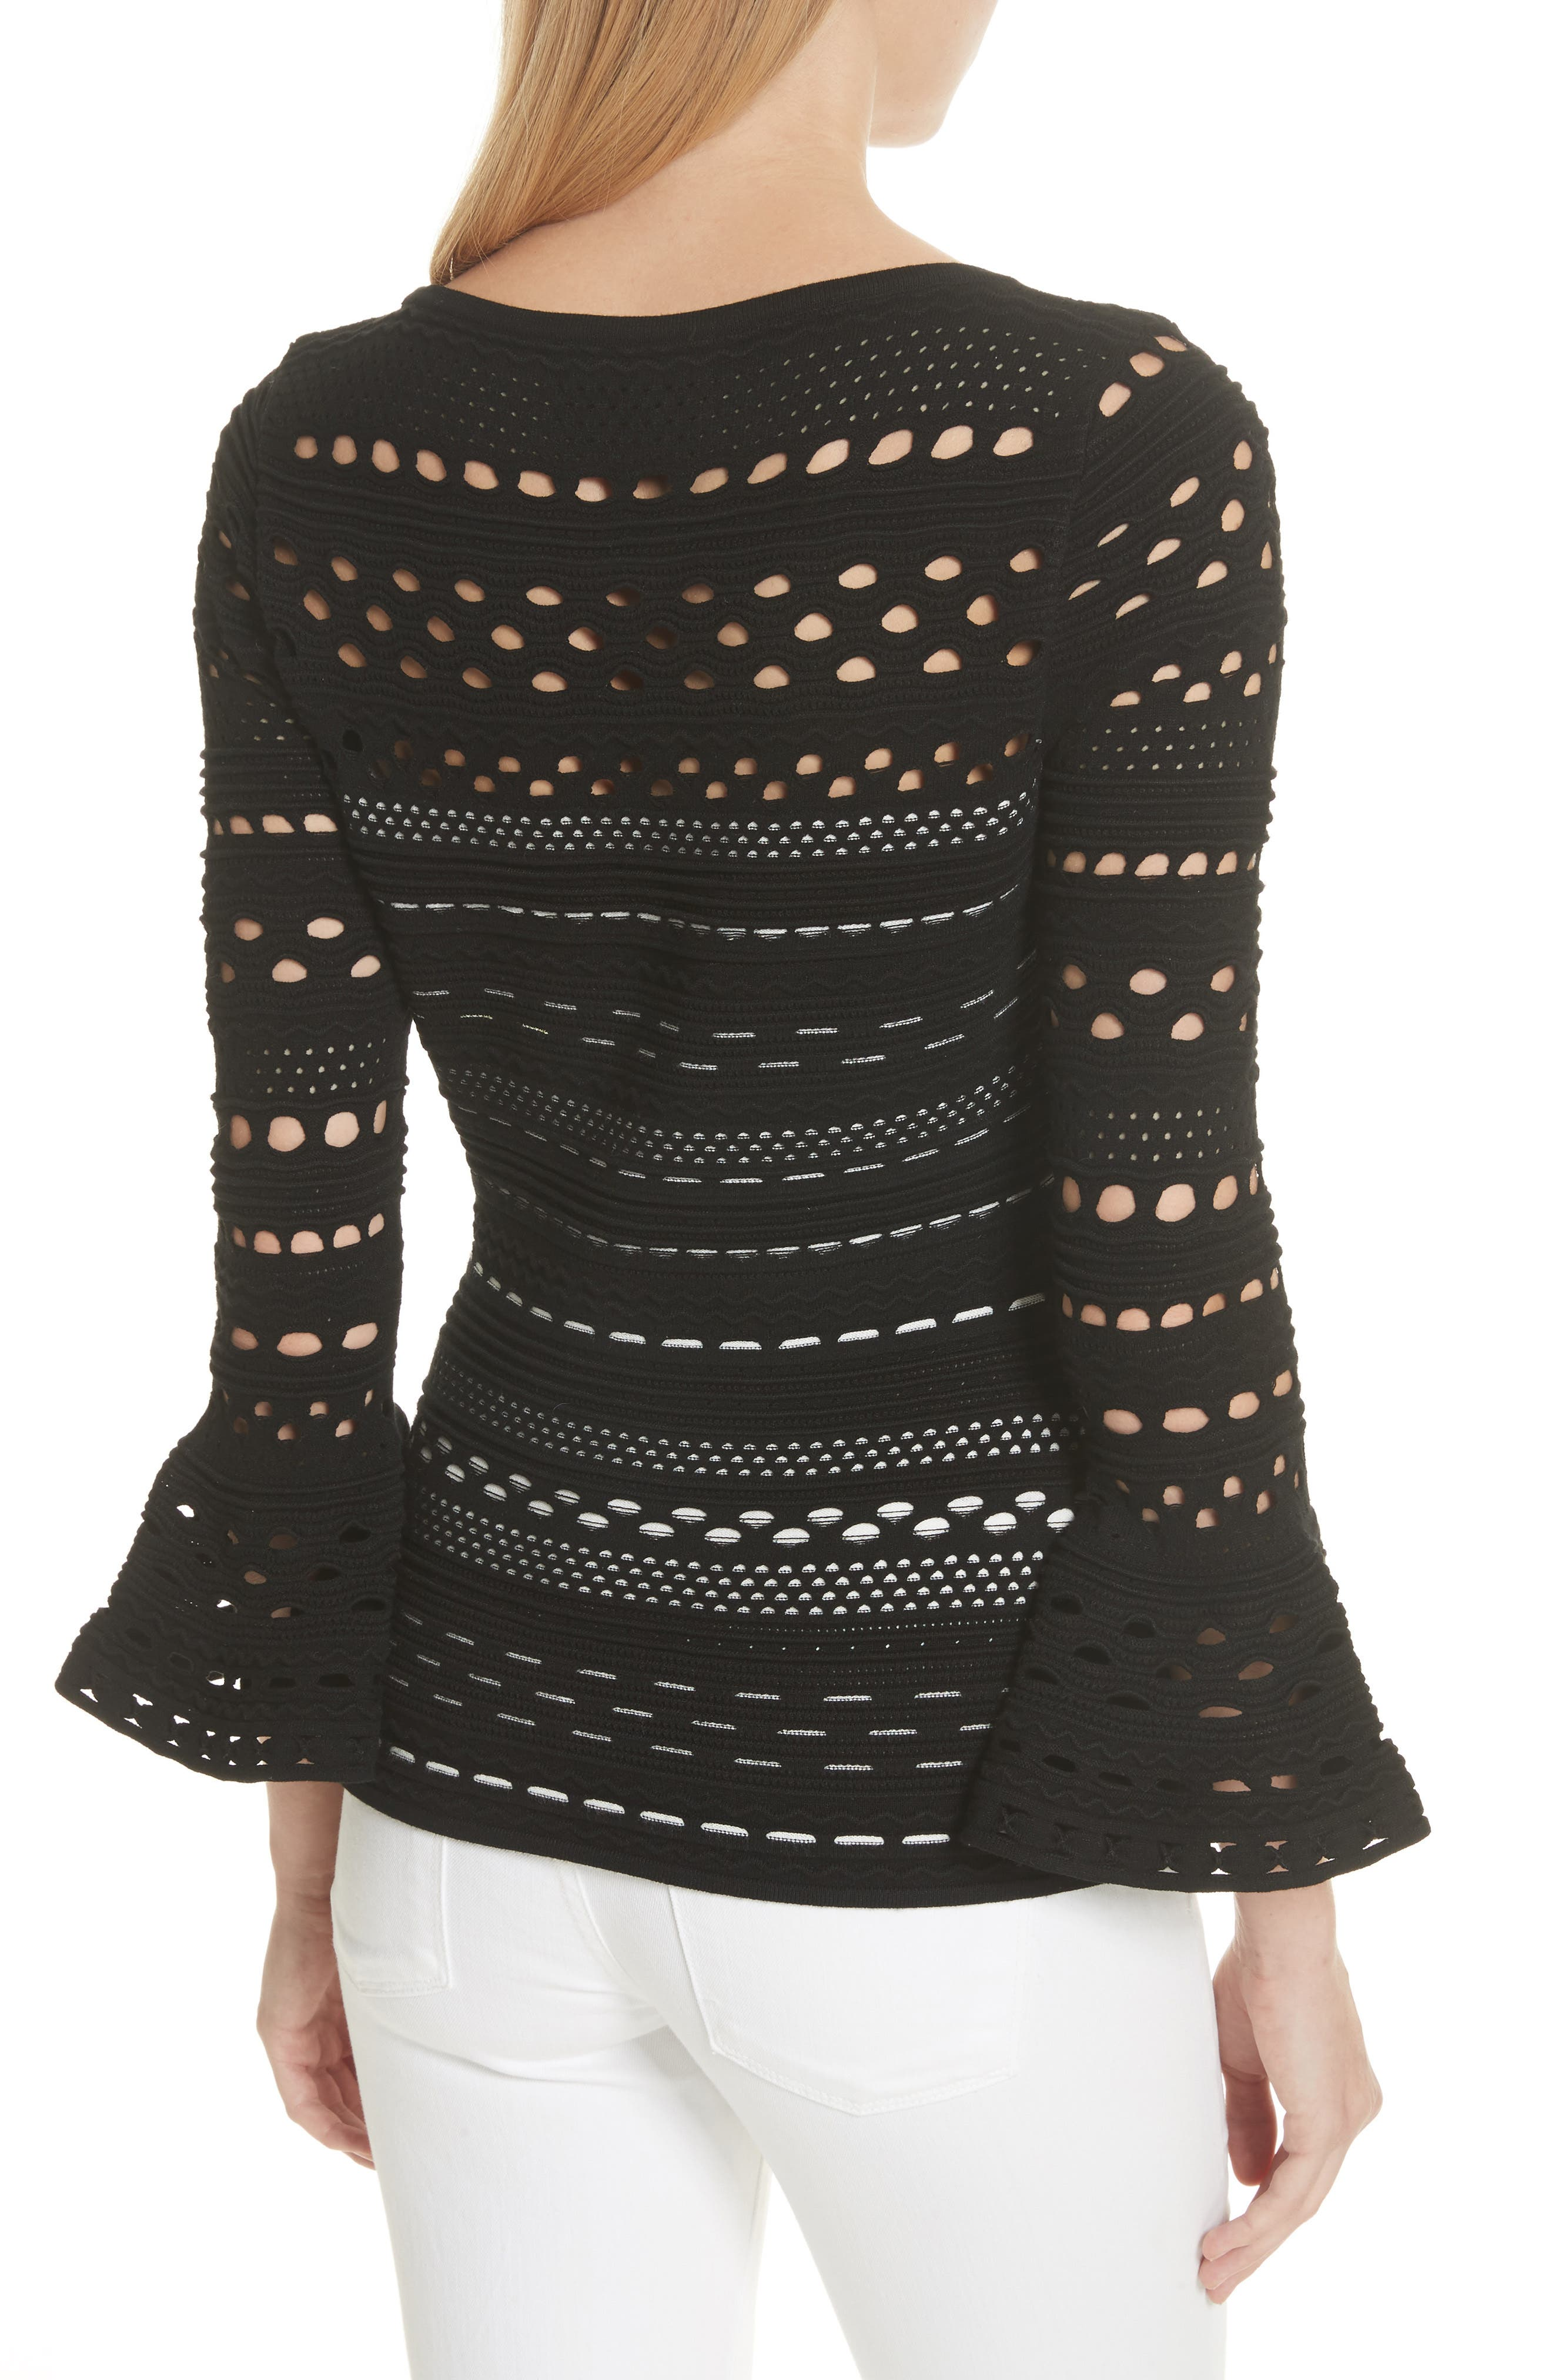 Lace Knit Top,                             Alternate thumbnail 2, color,                             Black/ White